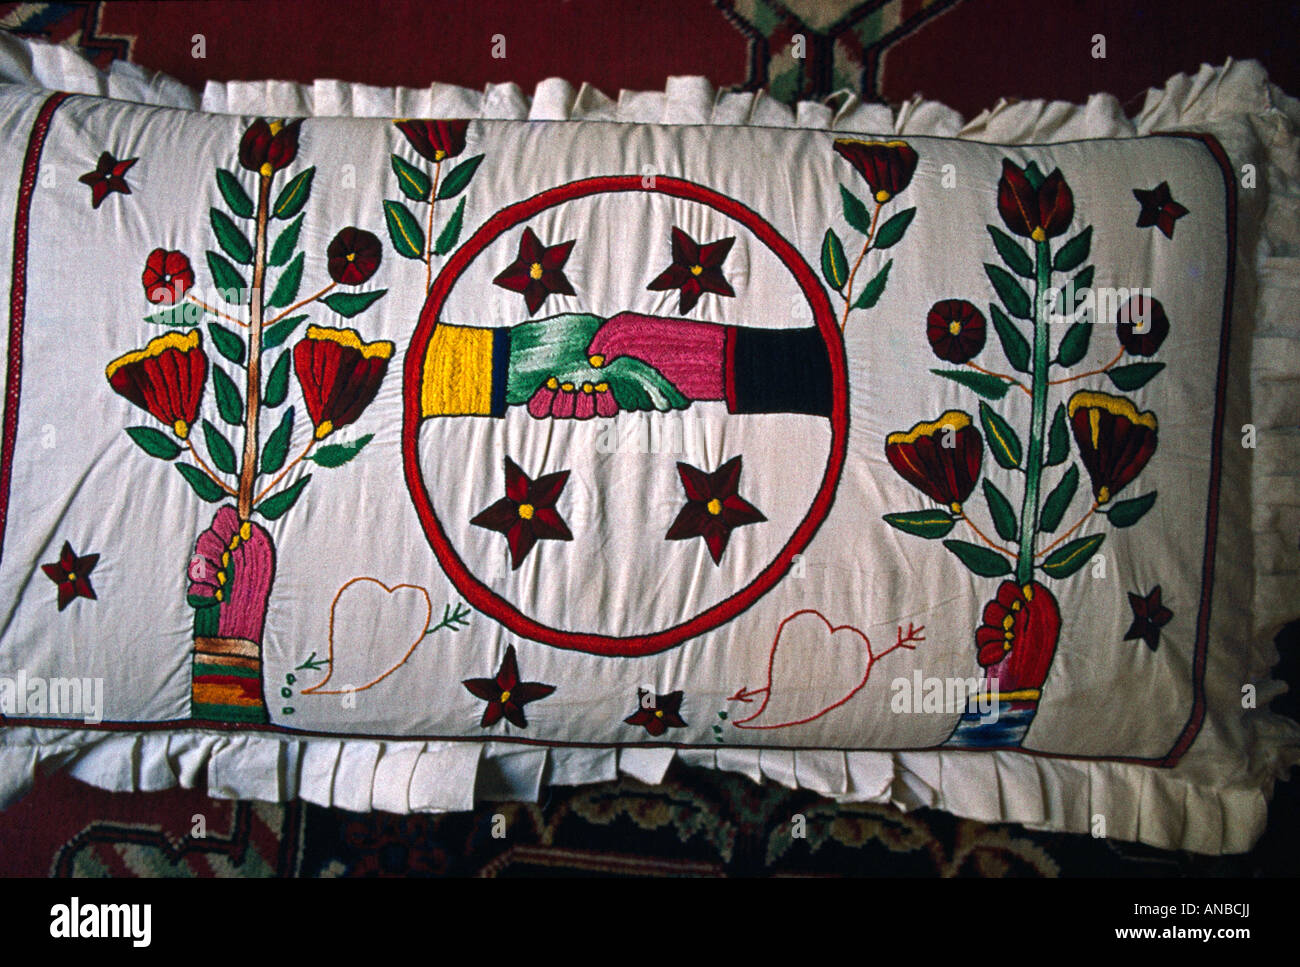 Asir Saudi Arabia Embroidered Cushion - Stock Image